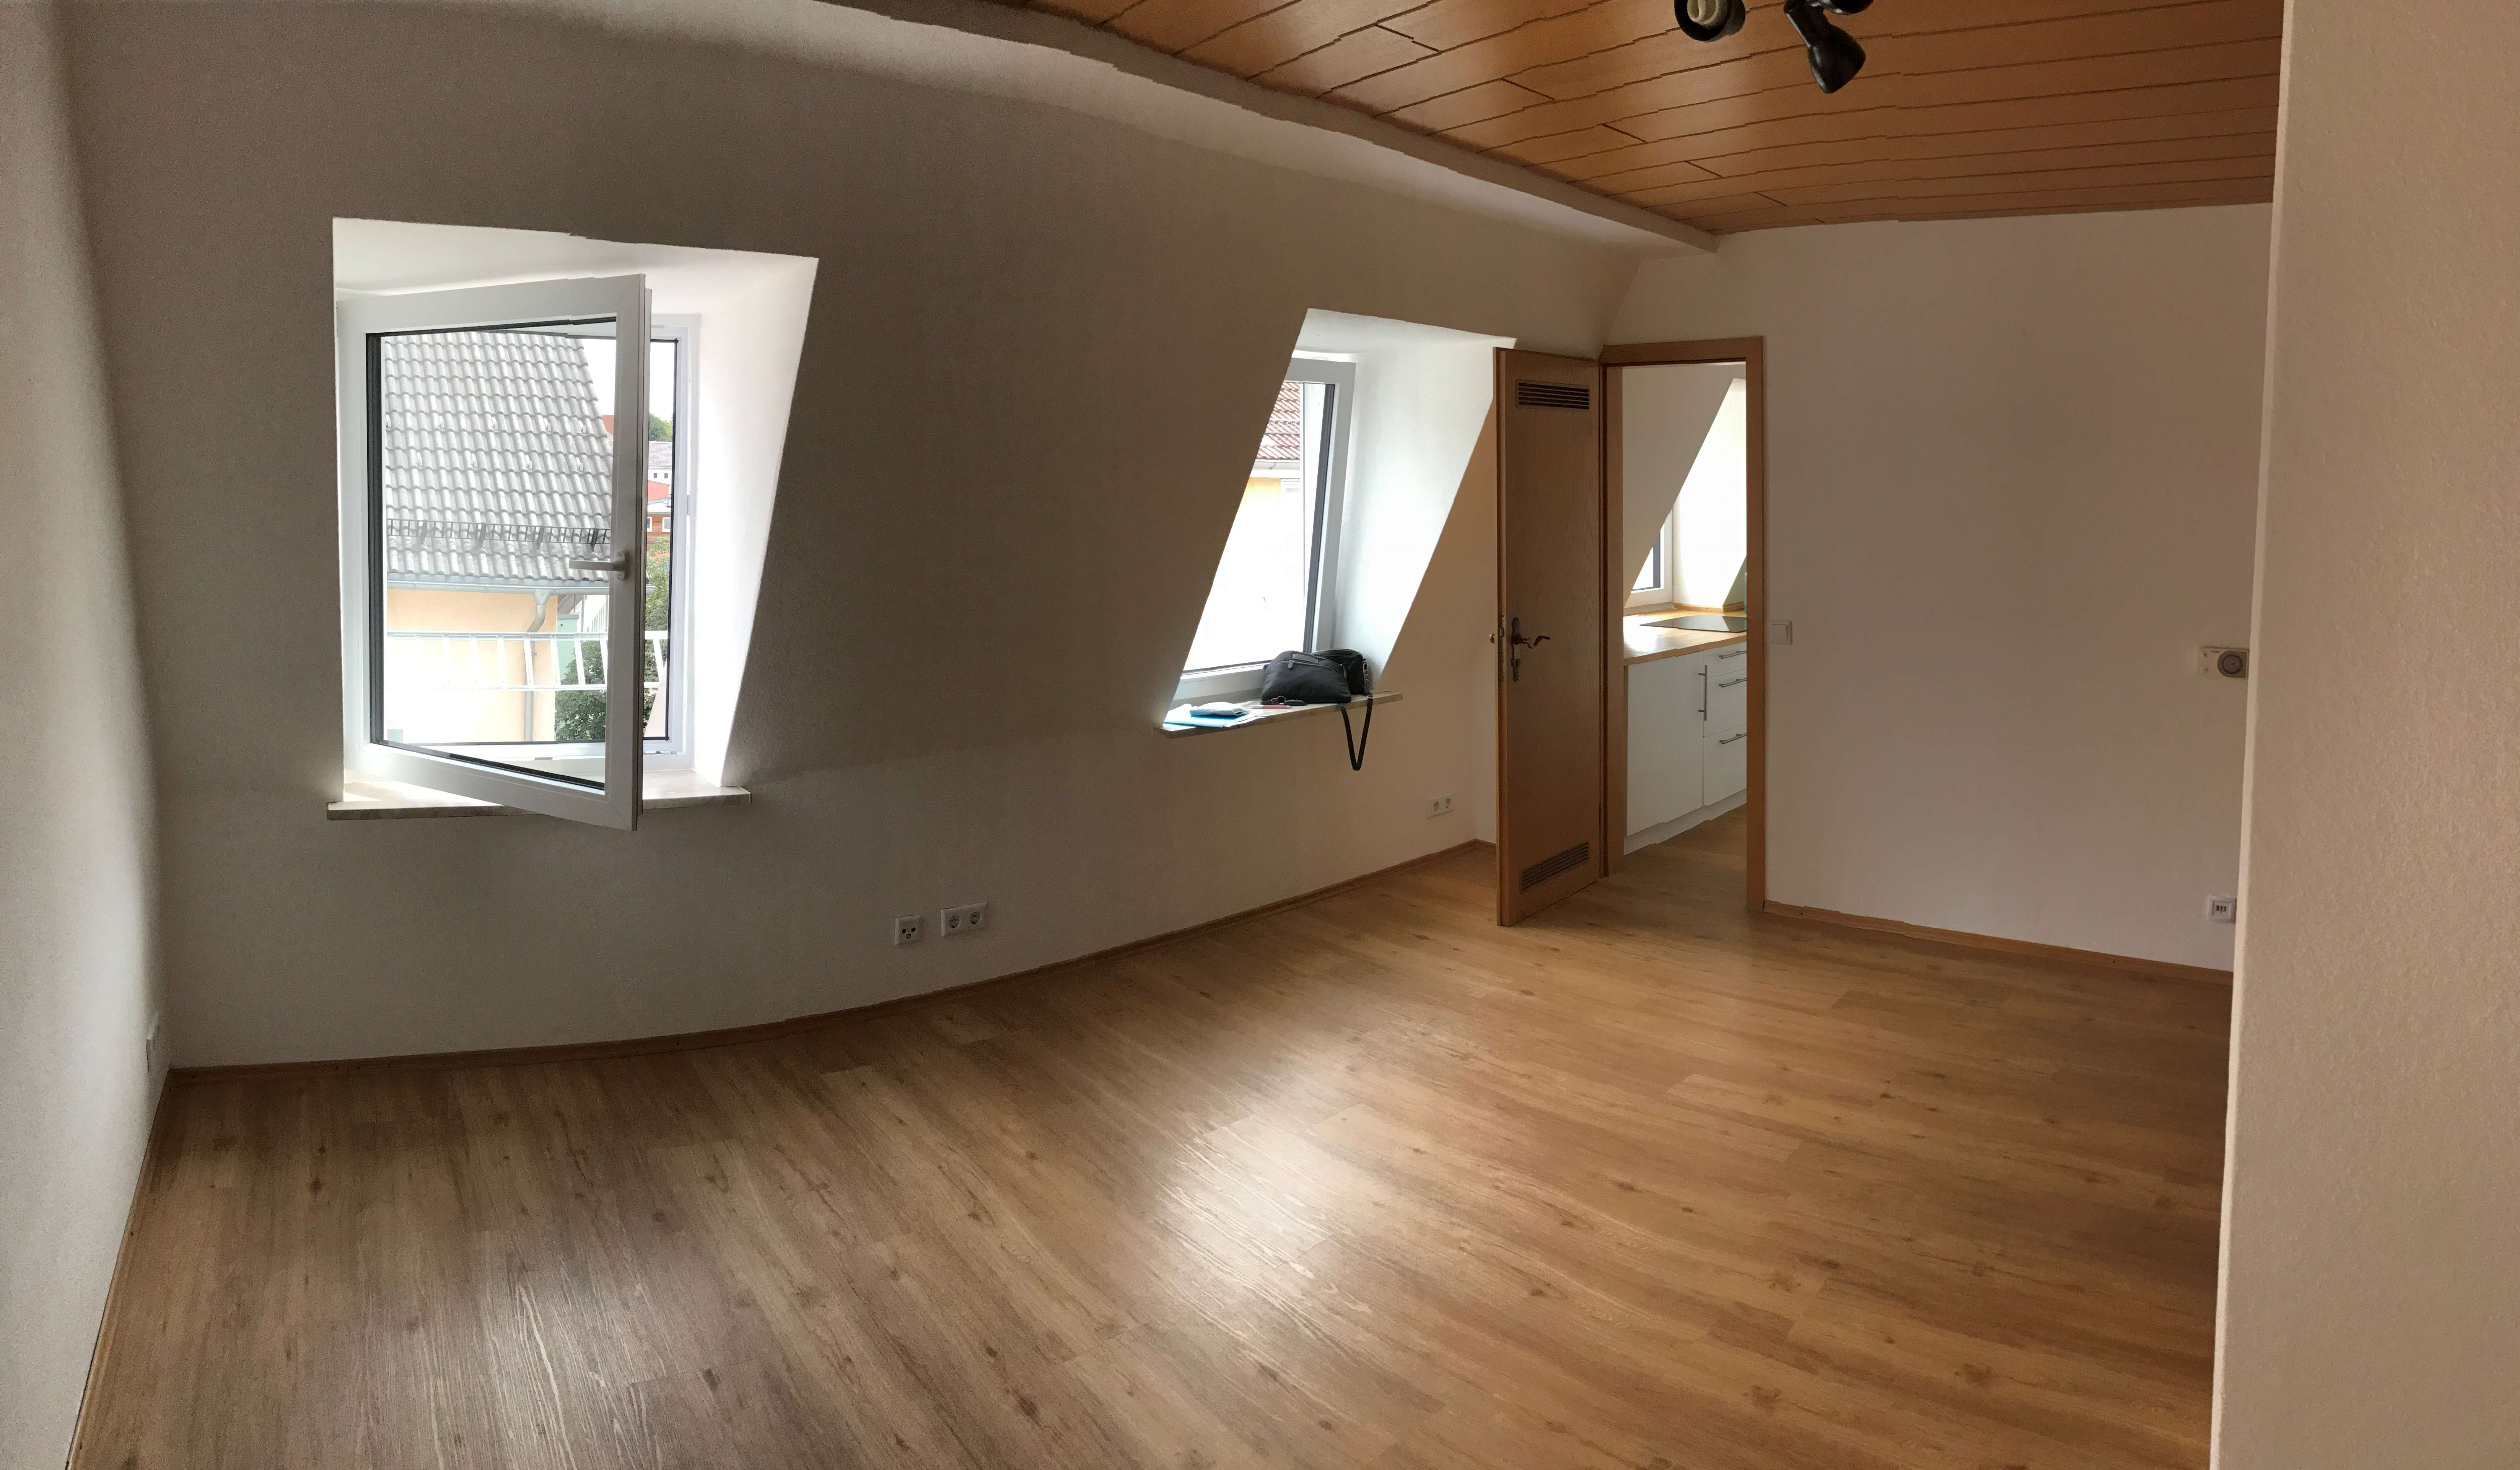 29 m², gemütliches Dachgeschoss,  350 €, zentral, ruhig in Kempten (Allgäu)-Innenstadt